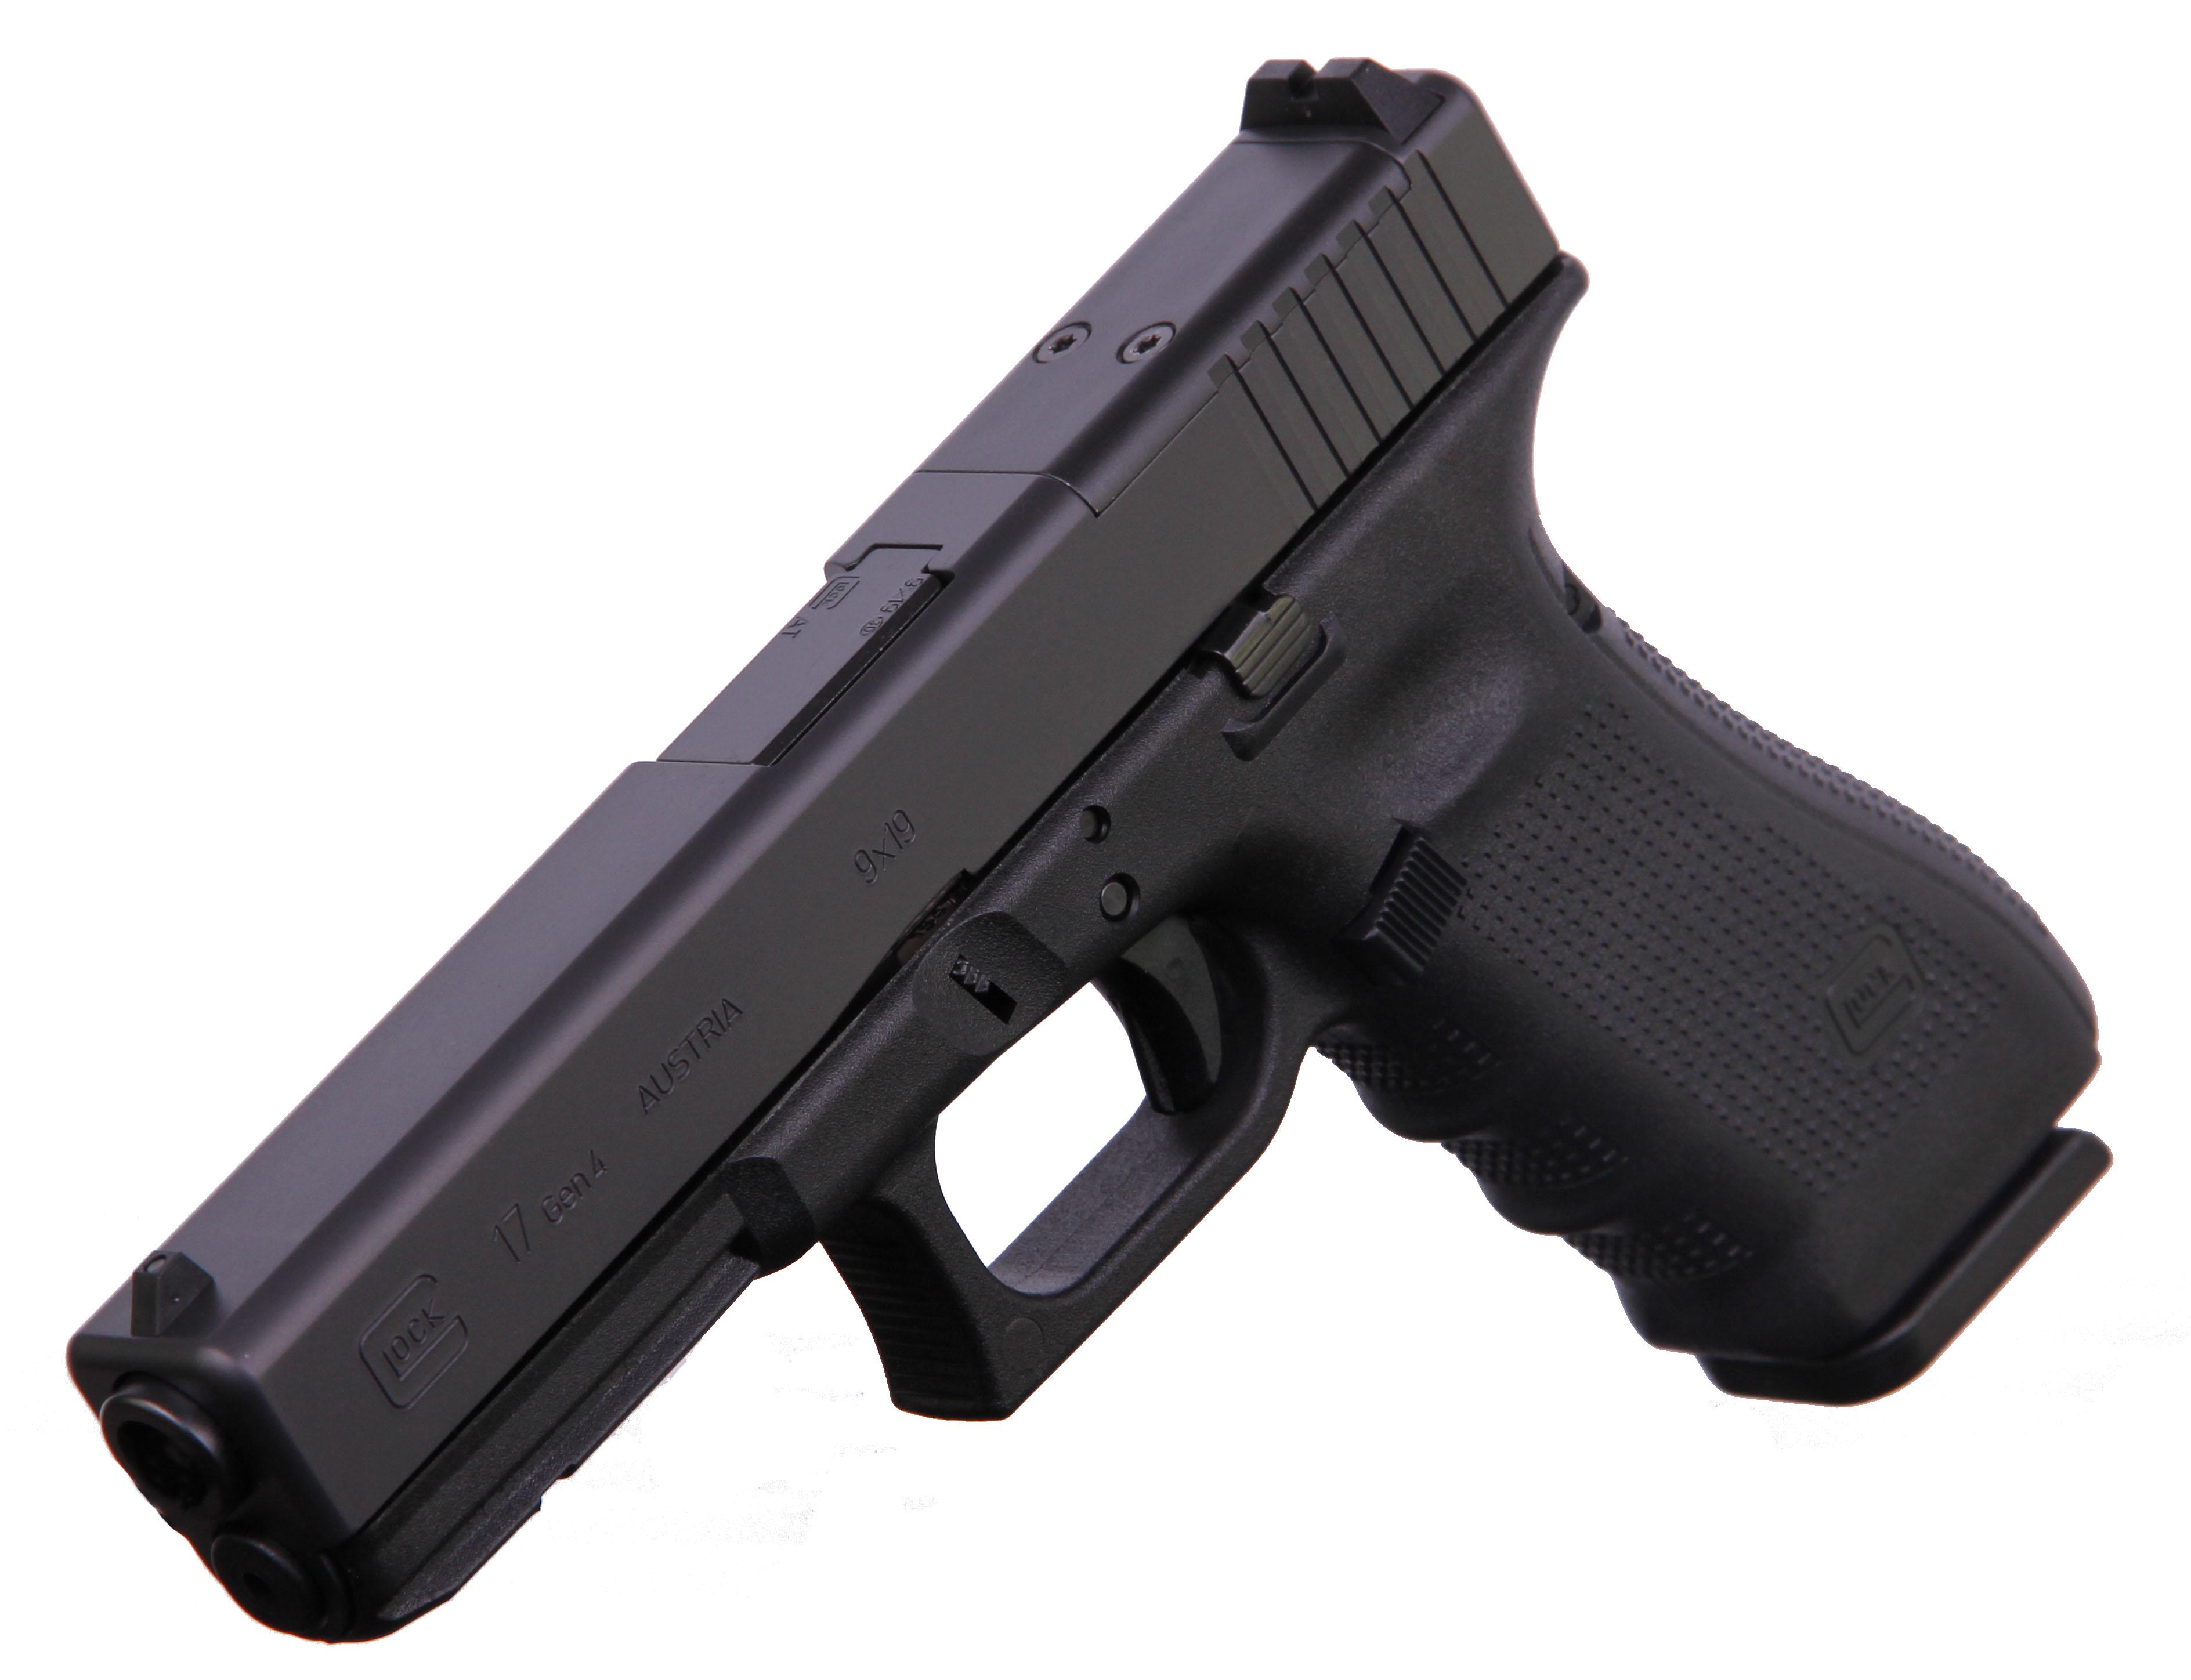 GLOCK G17 G4 MOS 9mm